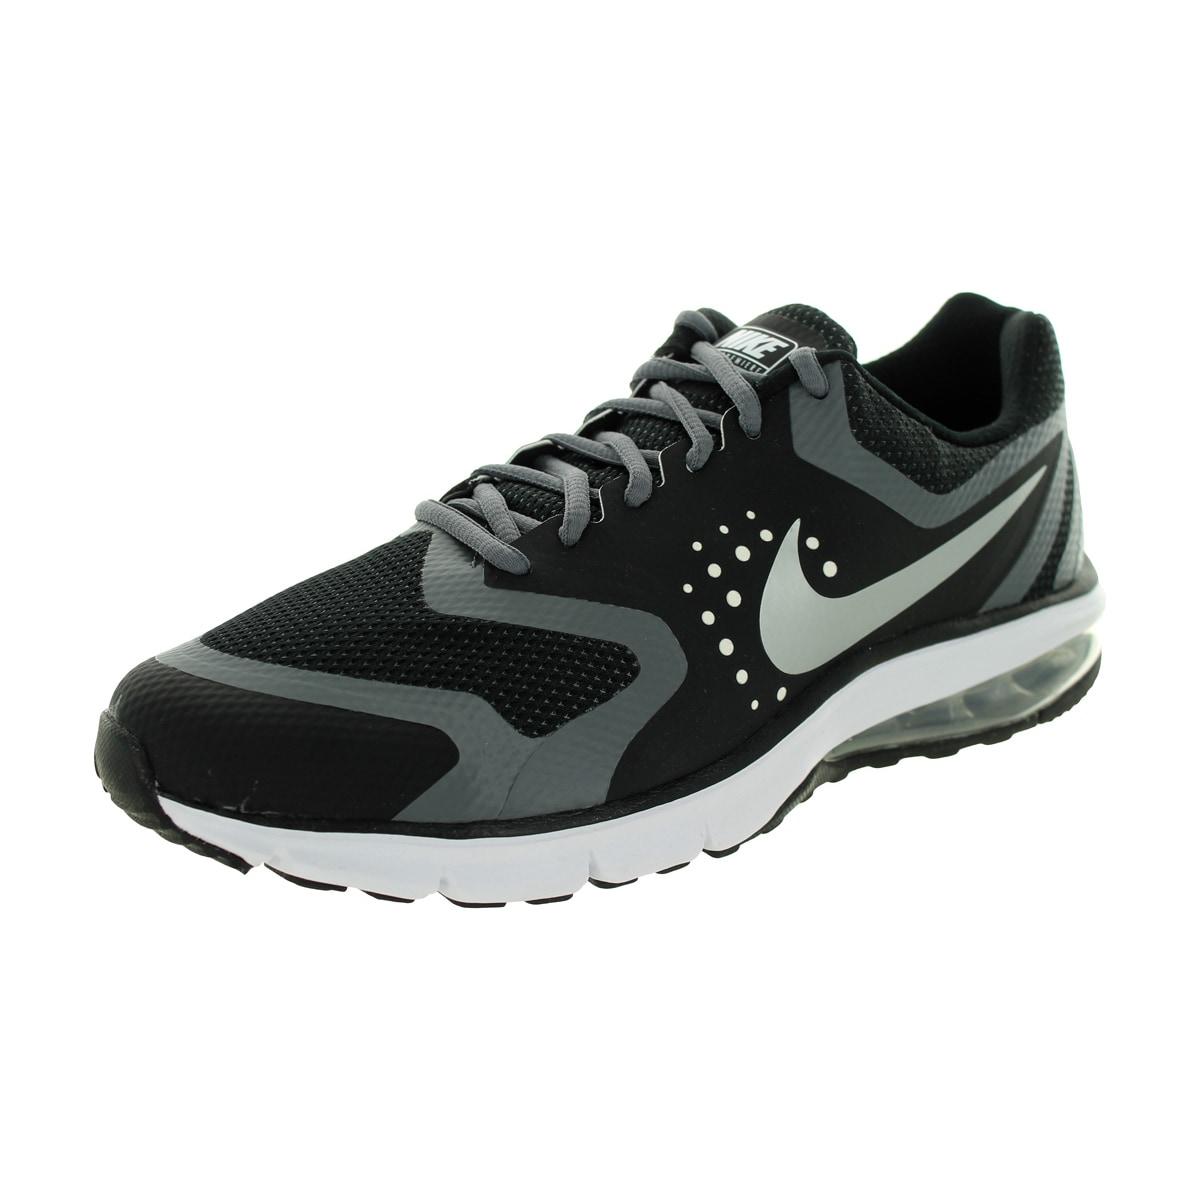 Nike Men's Air Max Premiere Run Black/Mlc Silver/Dark Gre...